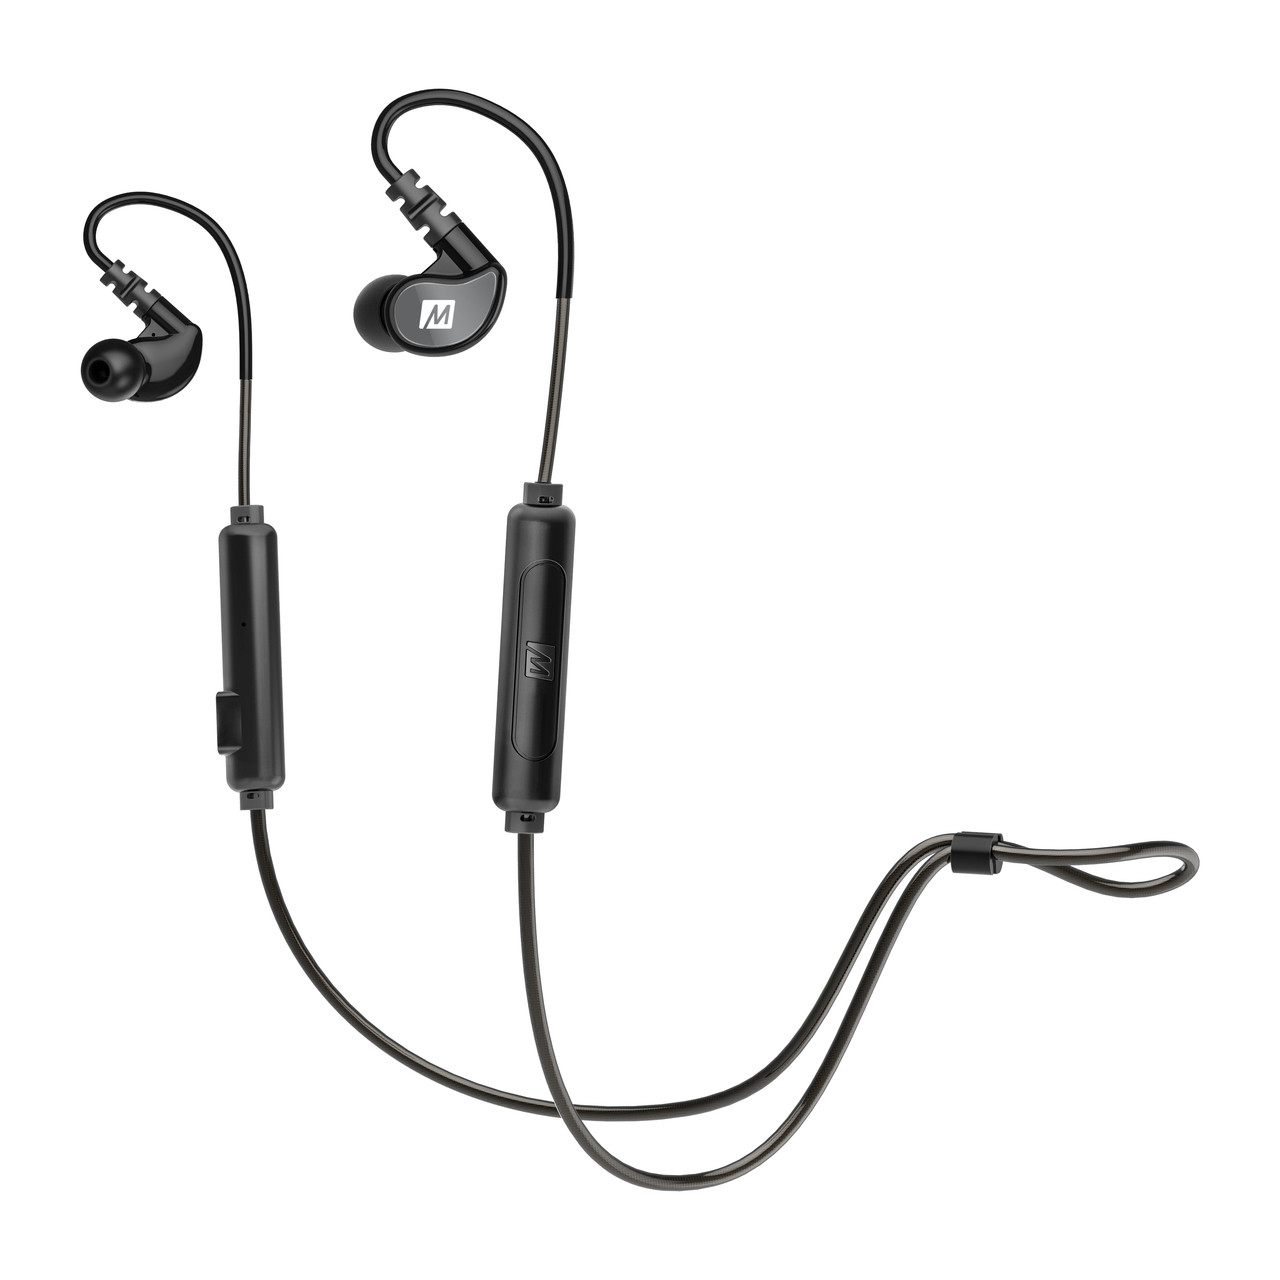 medium resolution of m6b wireless earphone 2019 version user manual